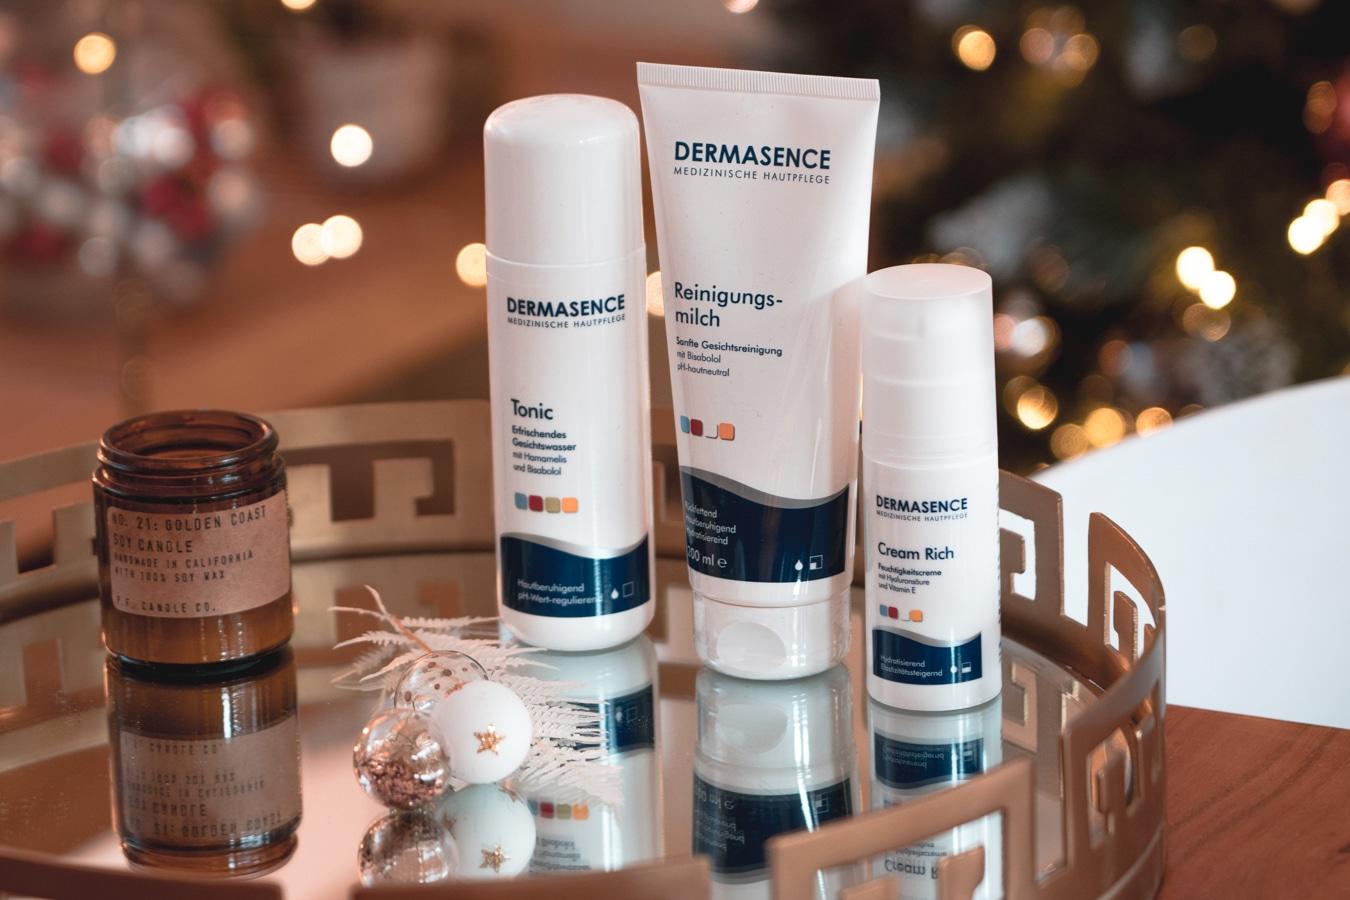 Adventskalender Türchen 4: Dermasence Hautpflege-Set